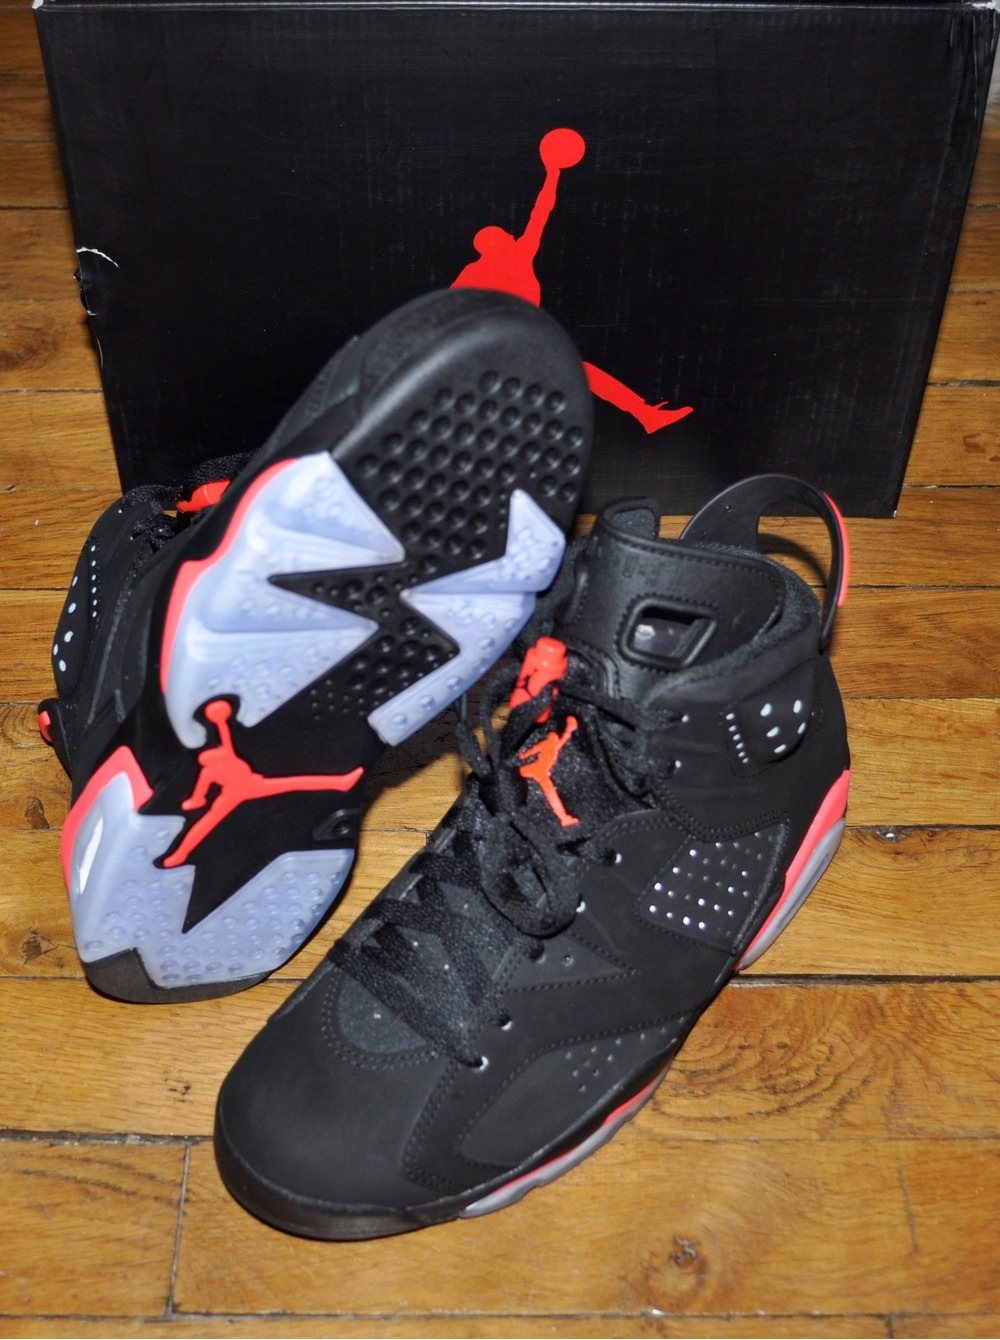 hot sales ffa9c e1c09 ... Nike Air Jordan 6 Black Infrared Size 7 Us 6 Uk 40 Eu - photo 3 ...